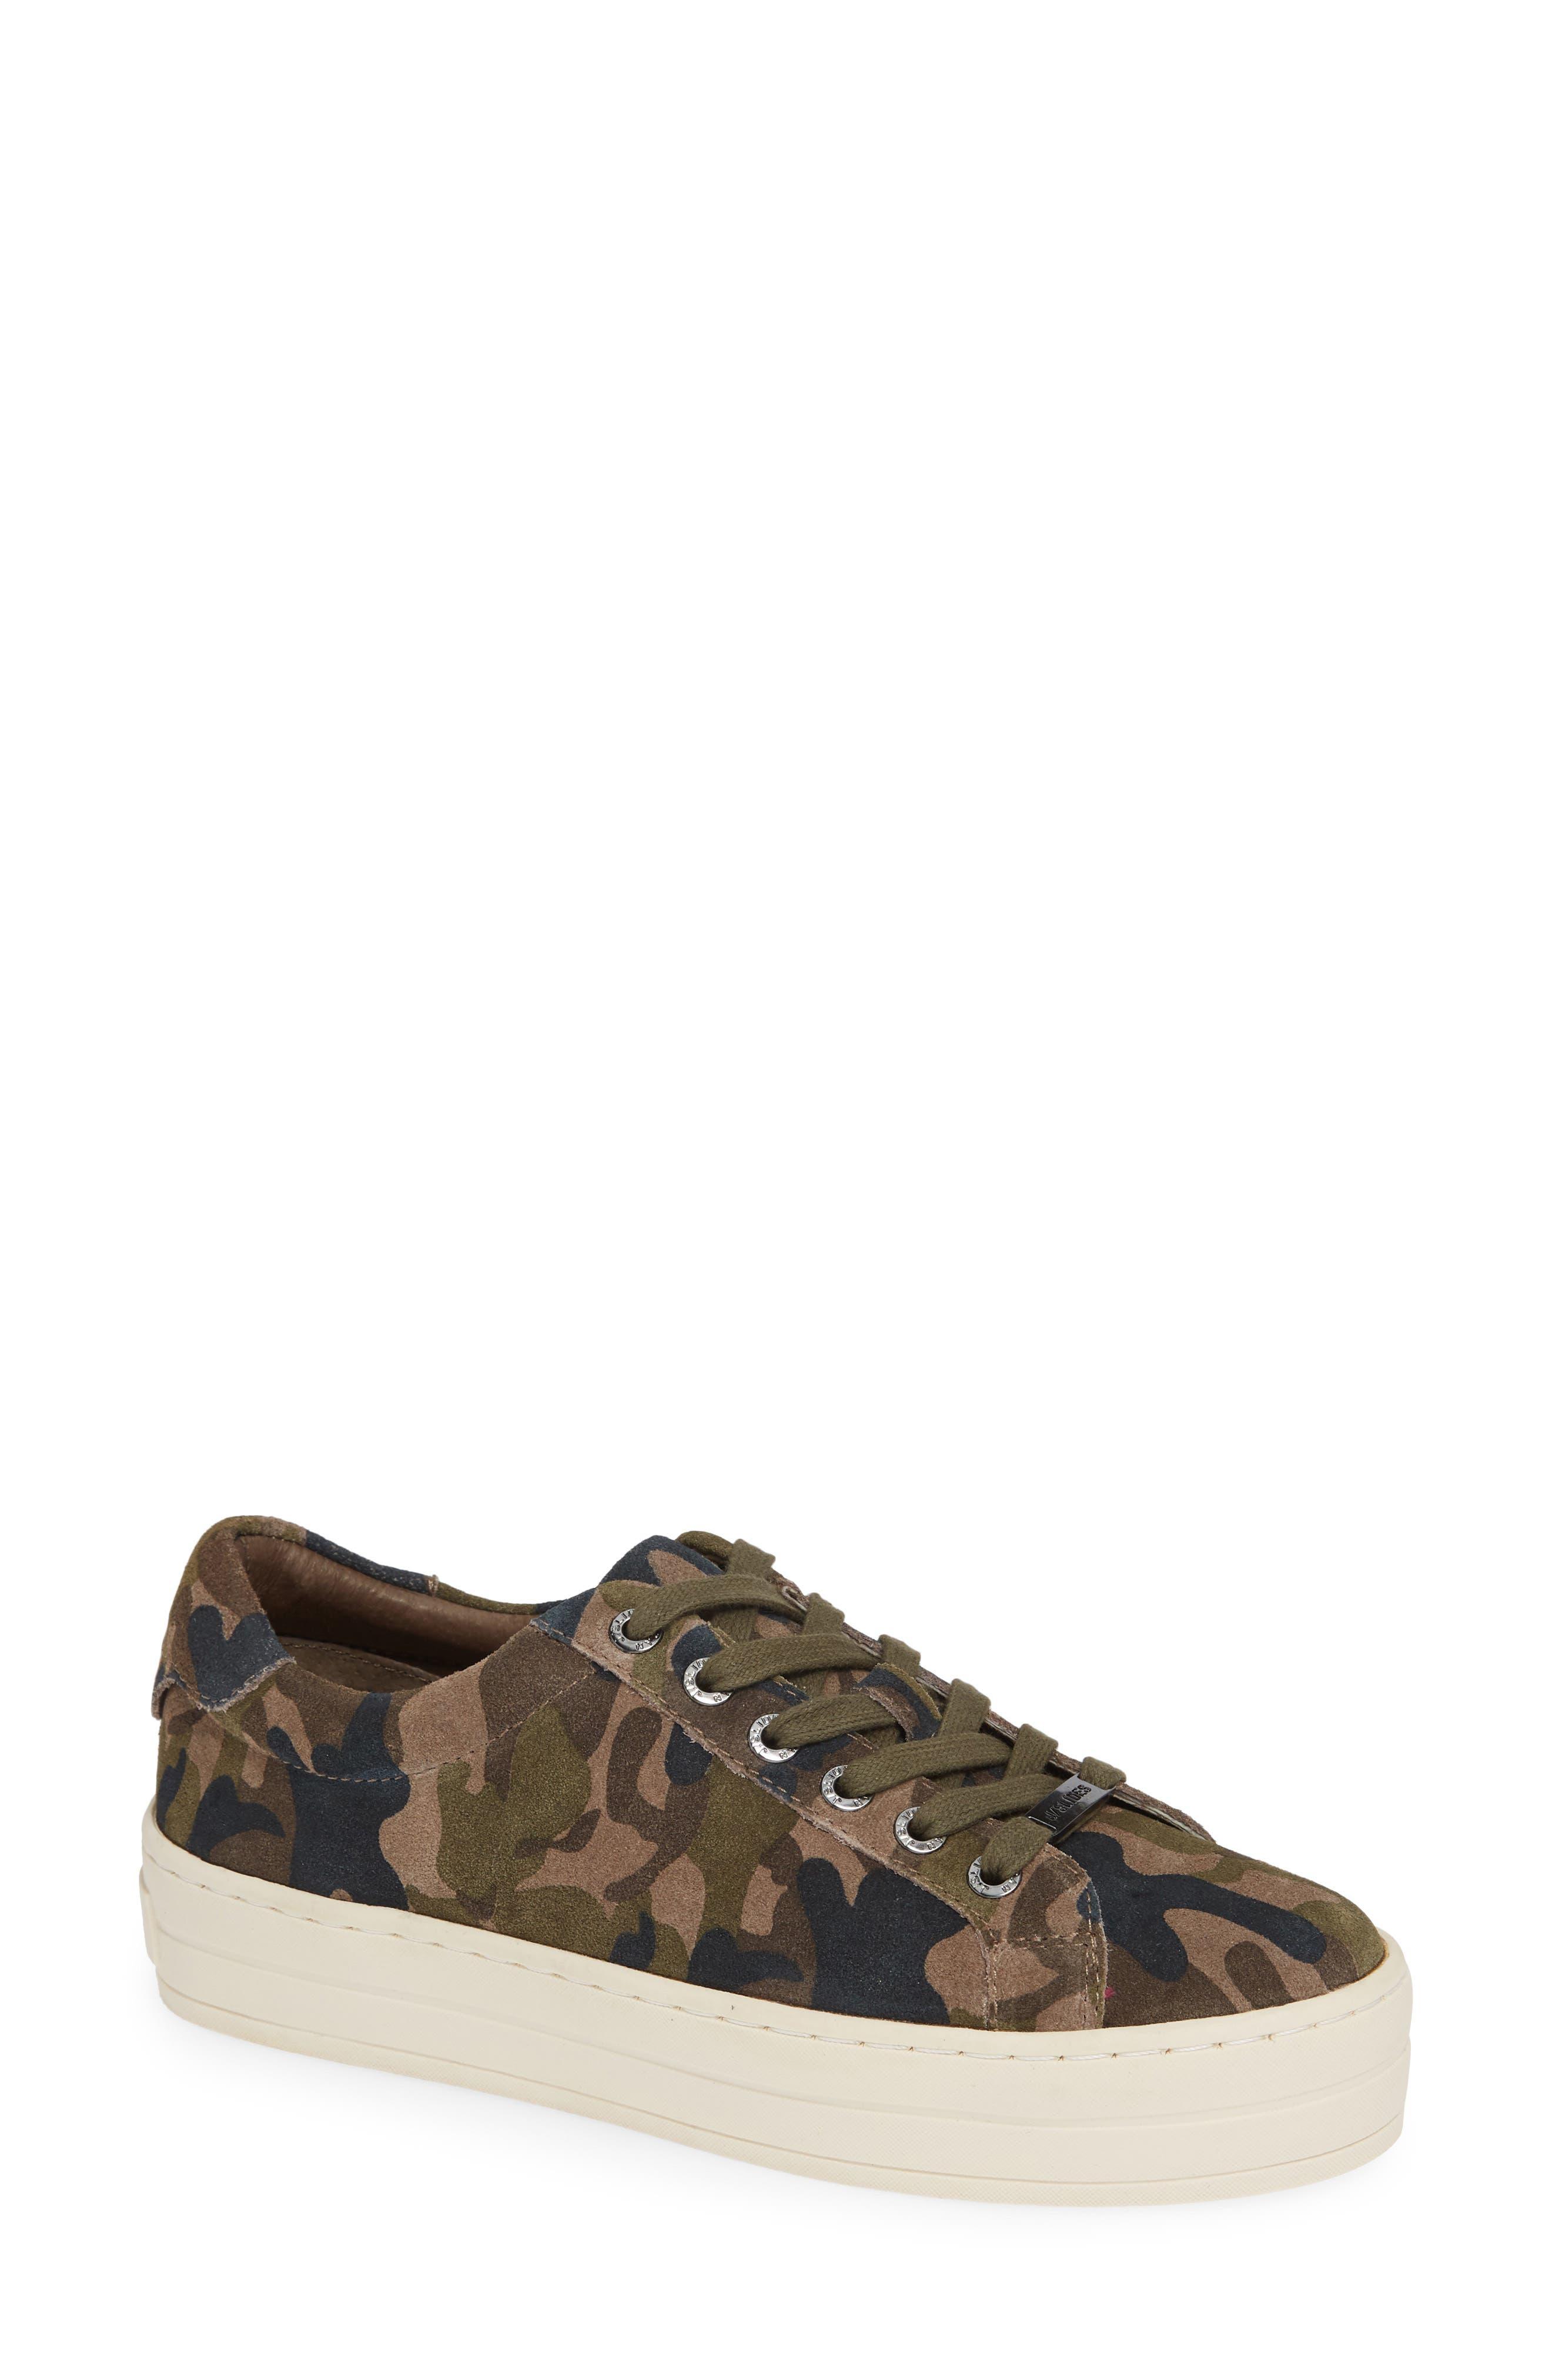 Jslides Hippie Platform Sneaker, Green